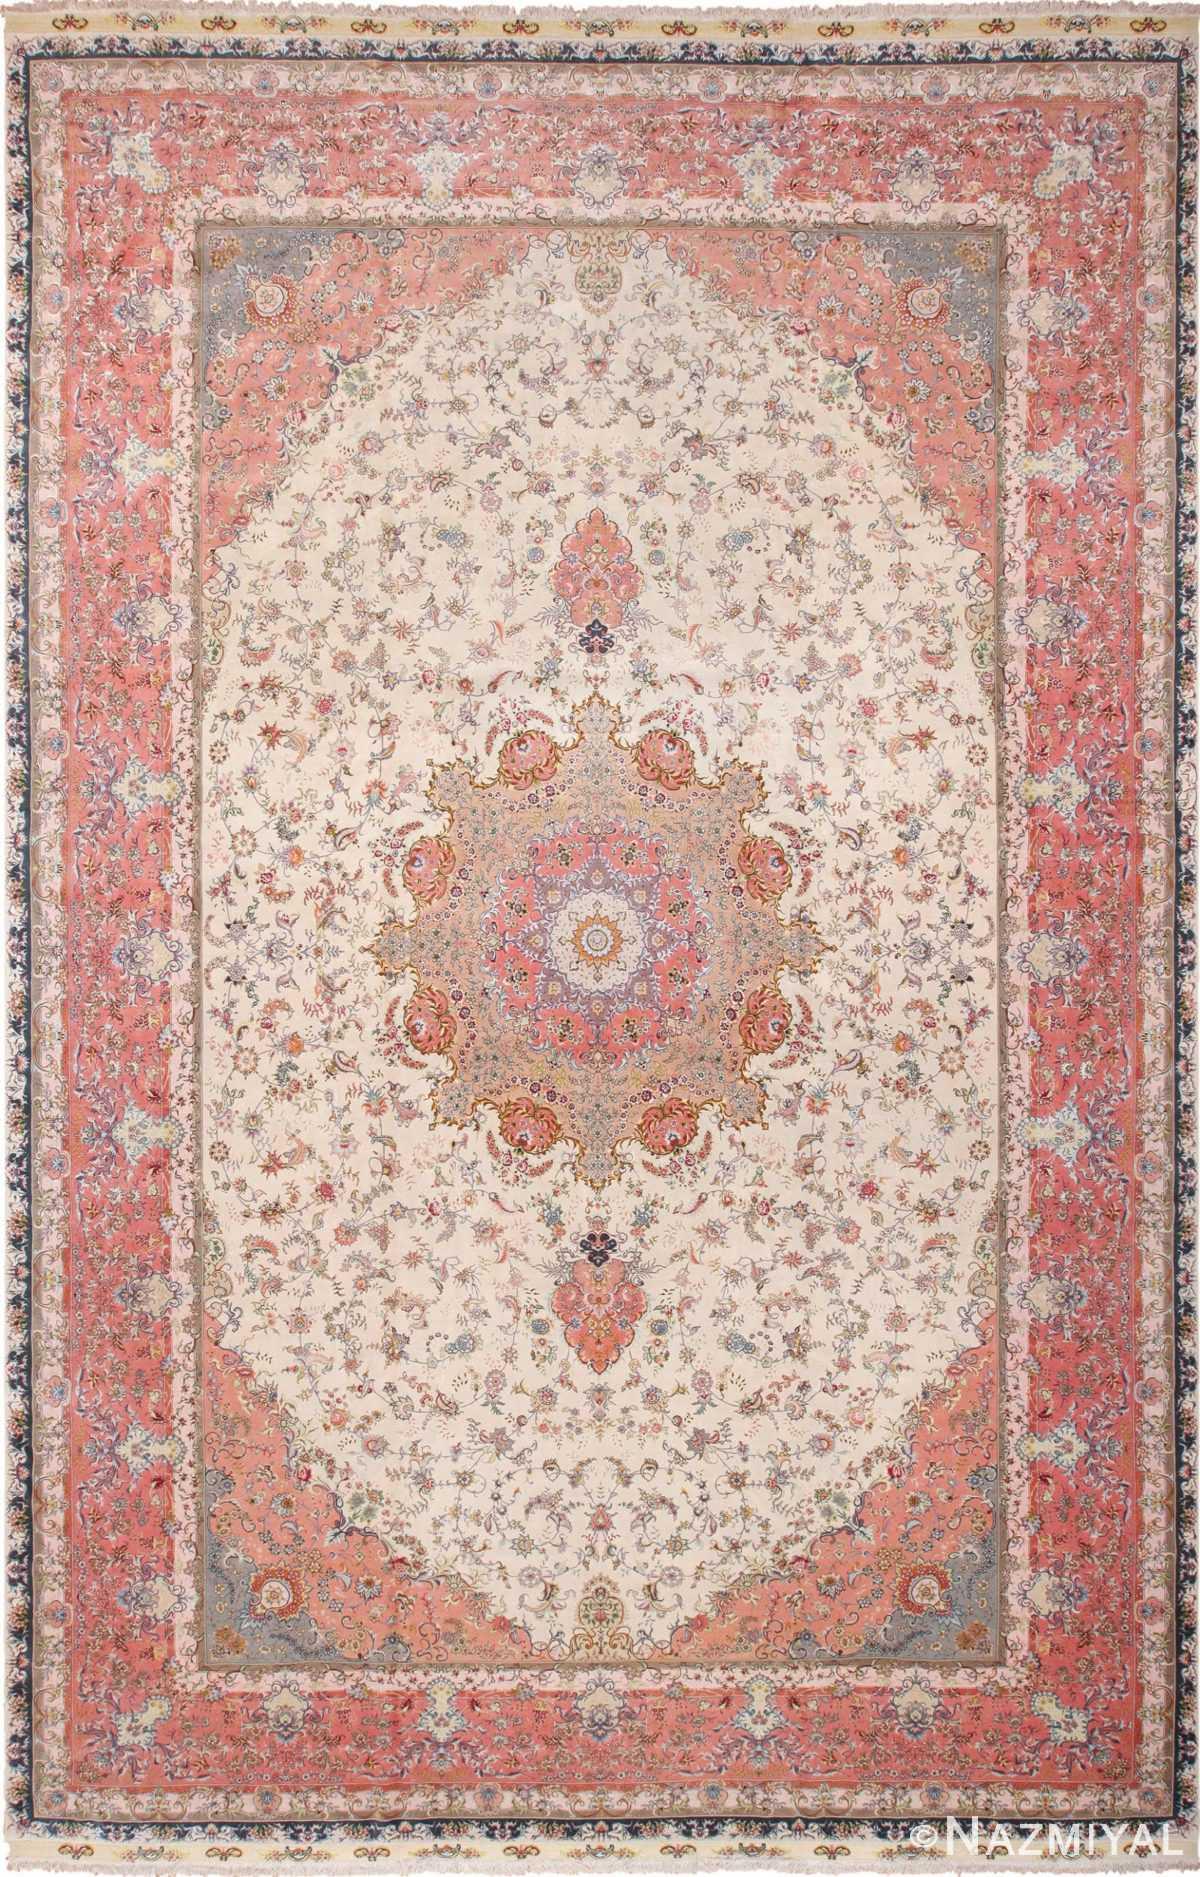 Large Silk and Wool Vintage Persian Tabriz Rug 60015 by nazmiyal